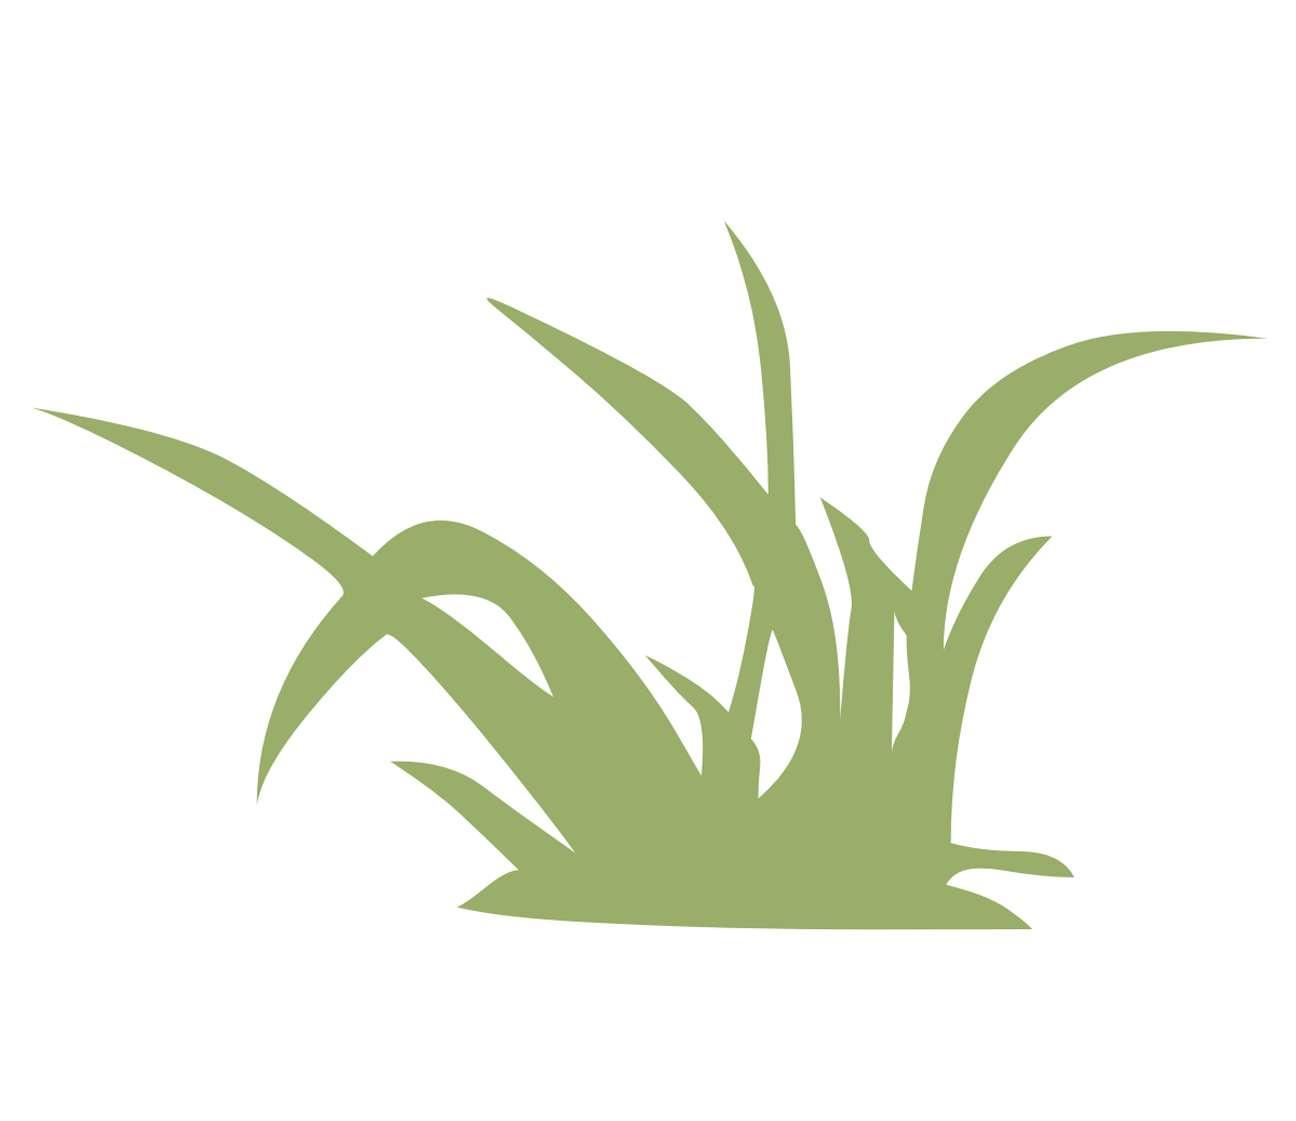 Picturesque Wandtattoo Wiese The Best Of Pflanzen Gras Grashalme Wandtattoo-wandbild-wandfoto-guenstig-billig-gute-wall-art-folie-im-shop-kaufen | Wegaswerbung Shop